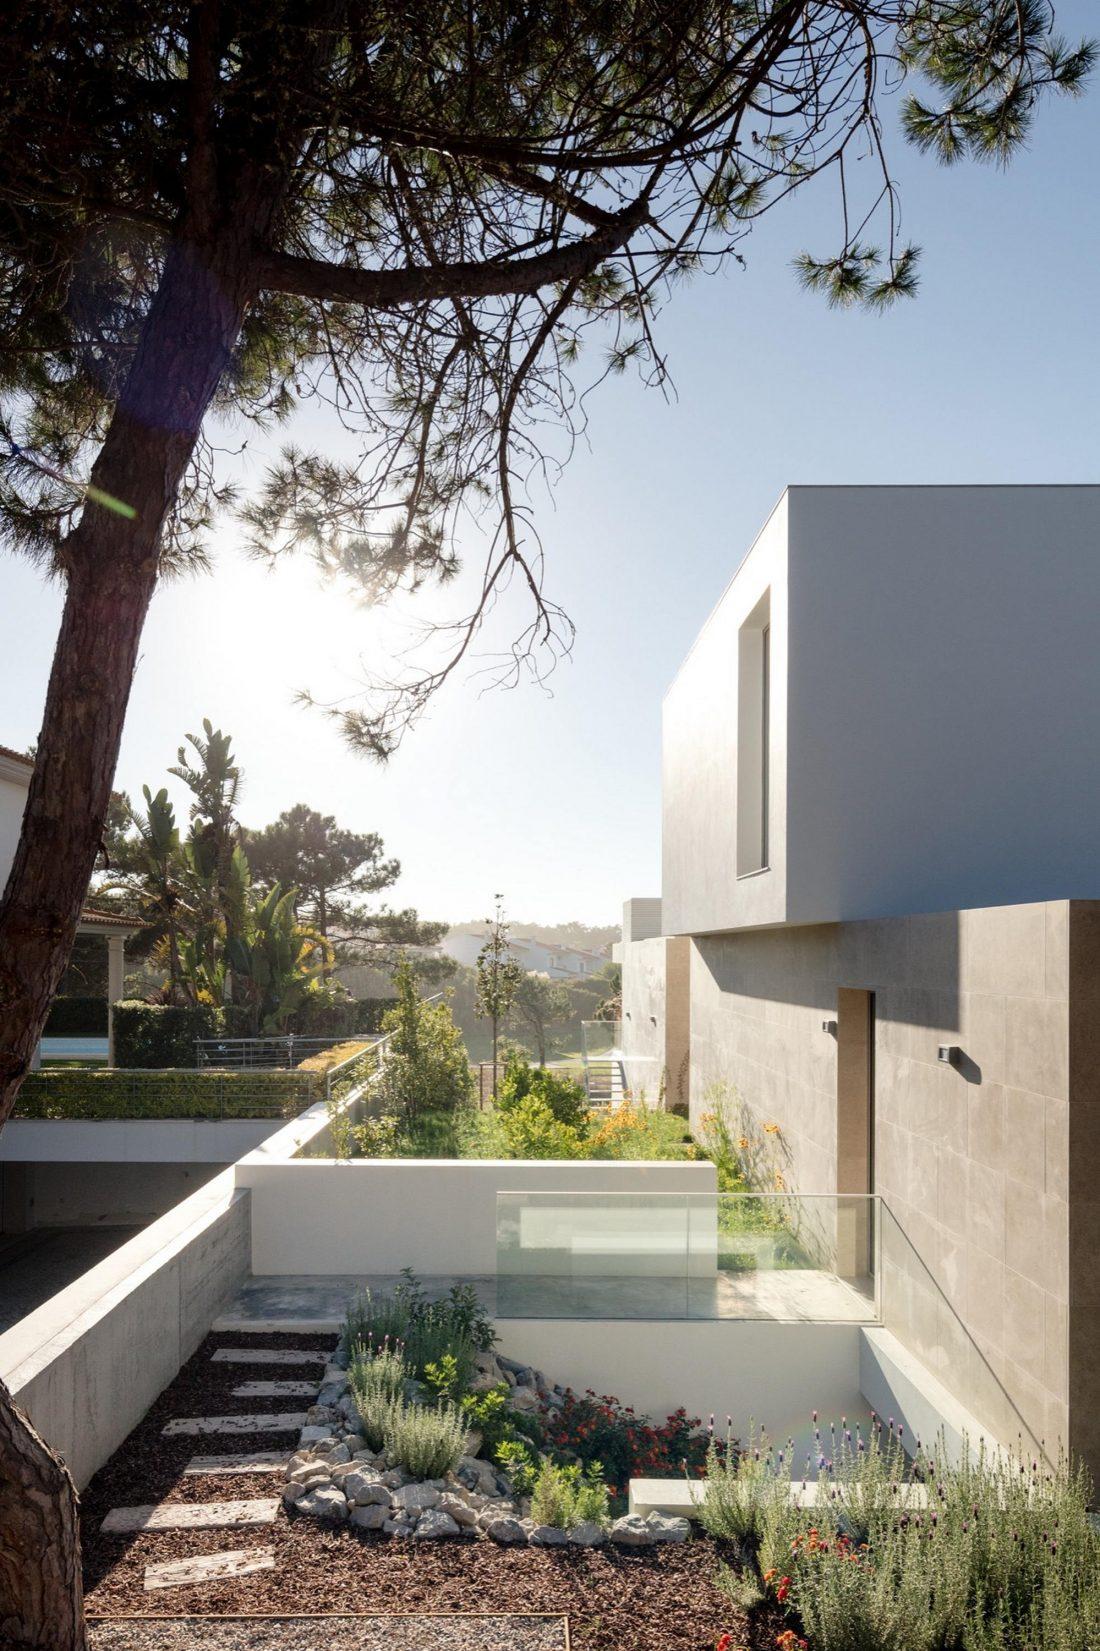 Дом в Обидуше, Португалия, от студии RSM arquitecto и Russell Jones Architects 22